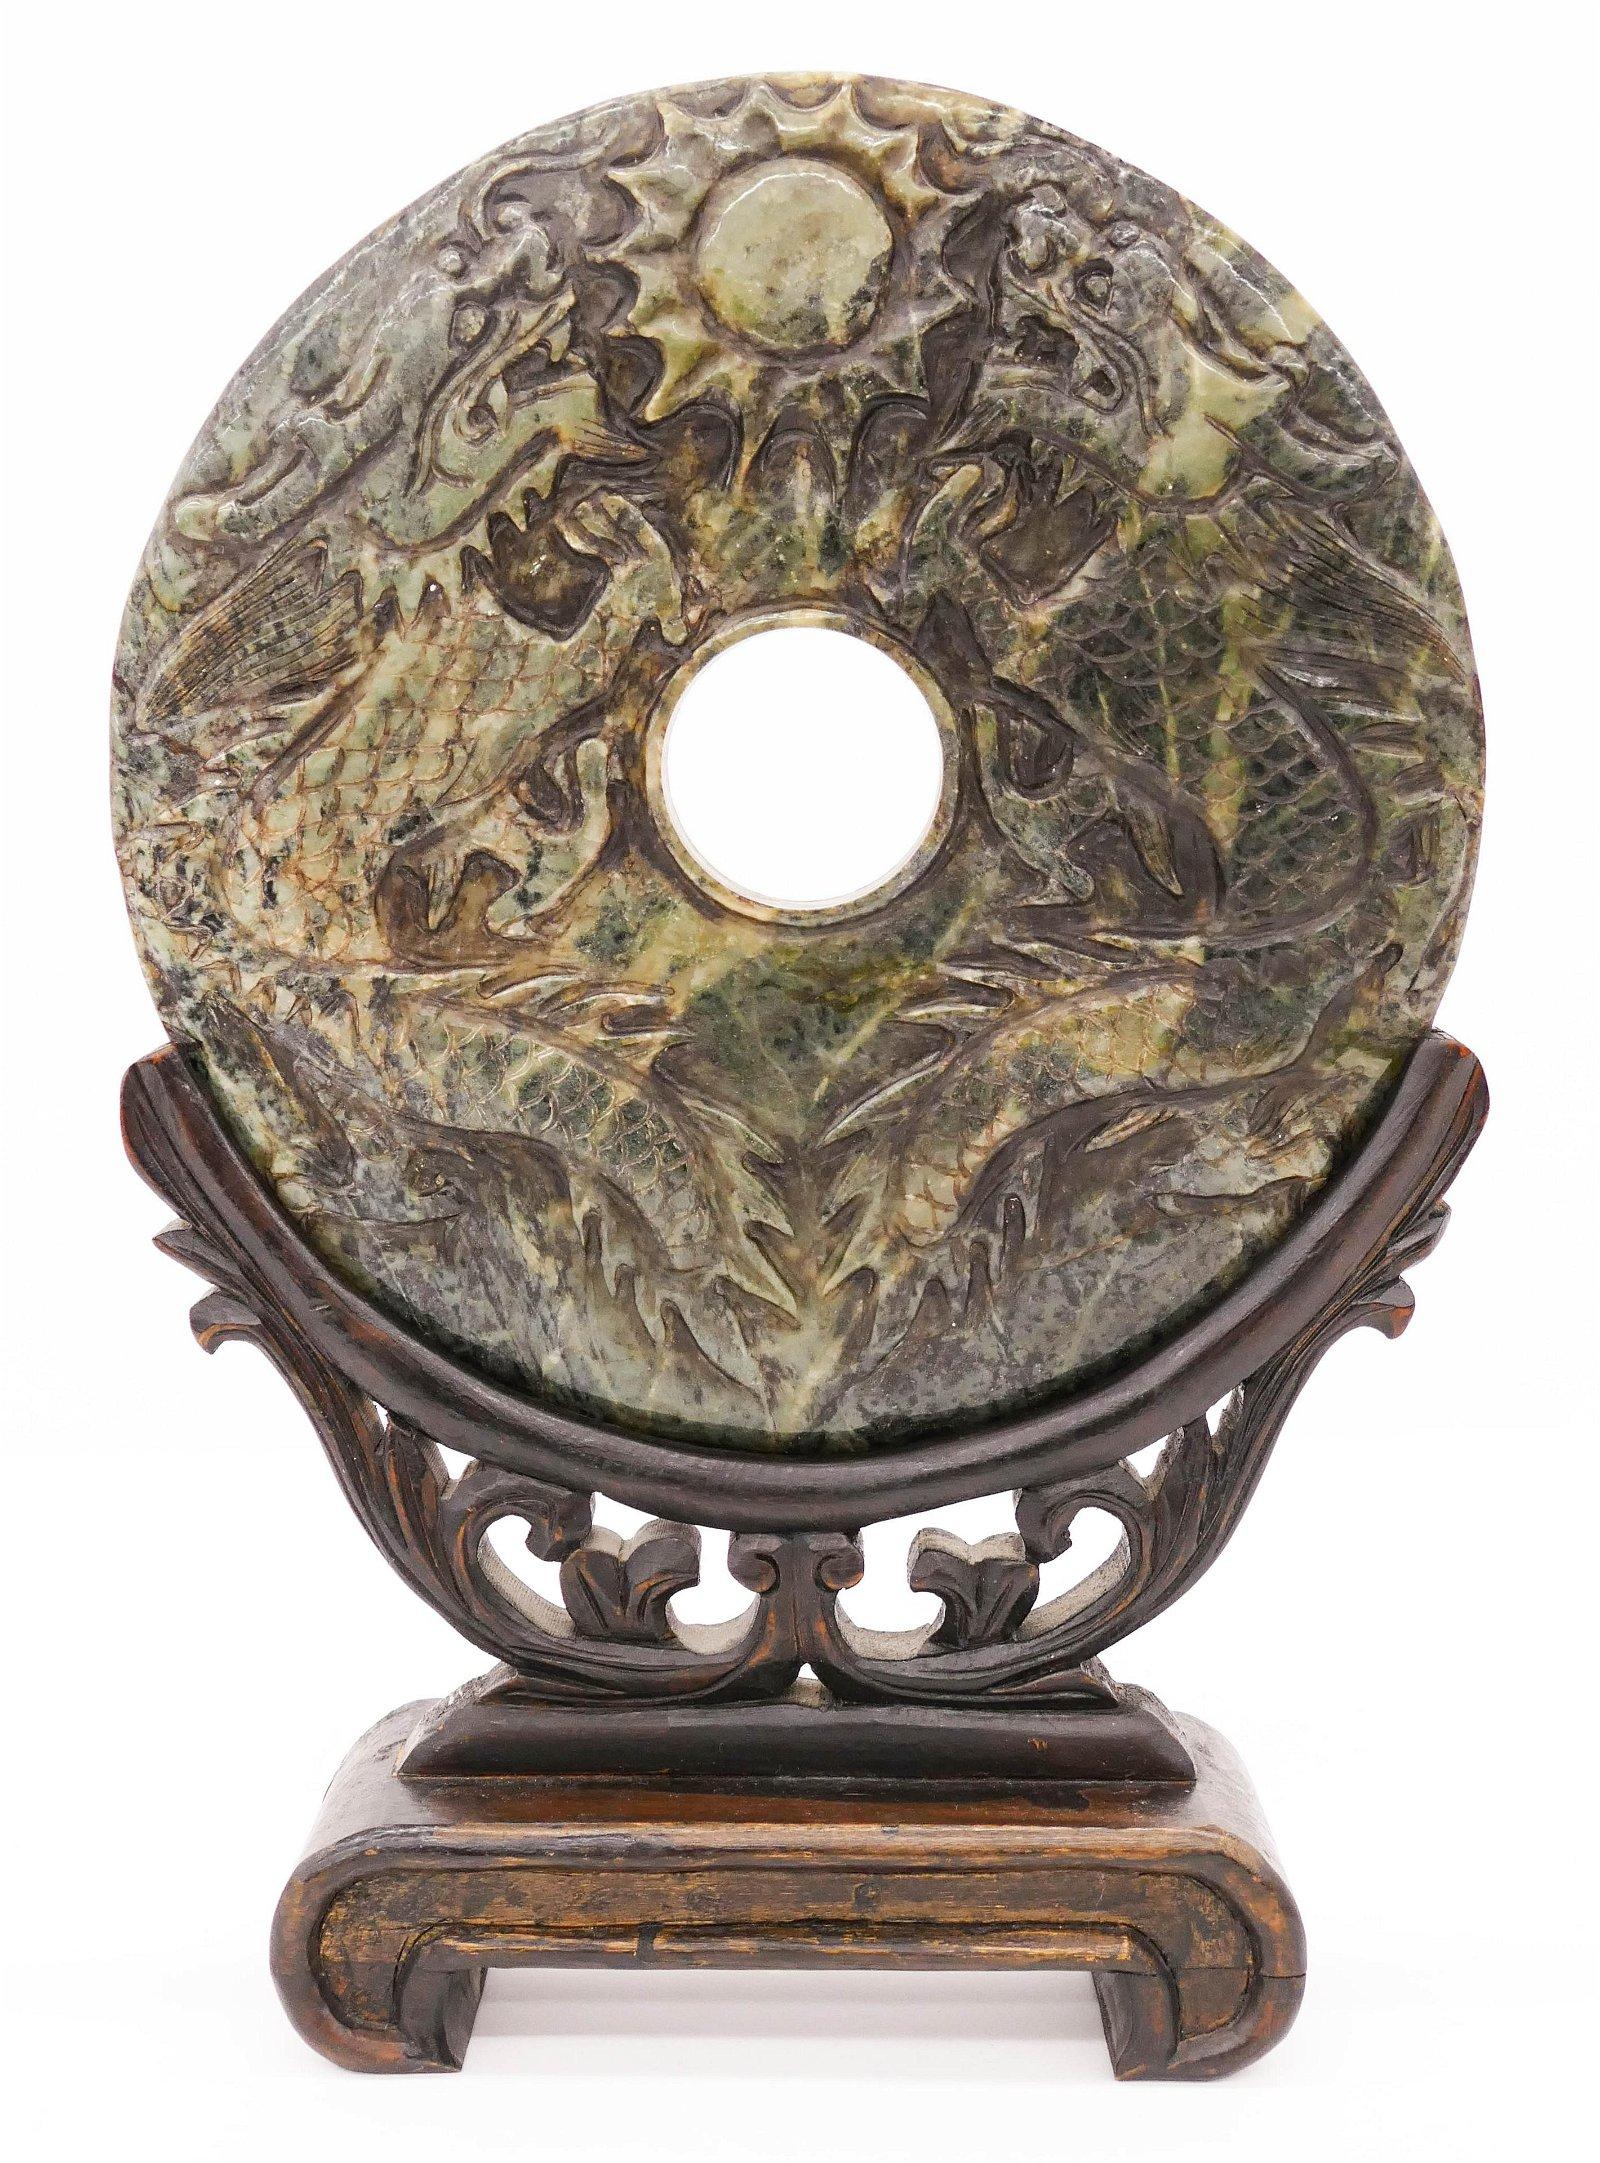 Chinese Jade Dragon Large Bi Disc on Stand 14.5''x10''.